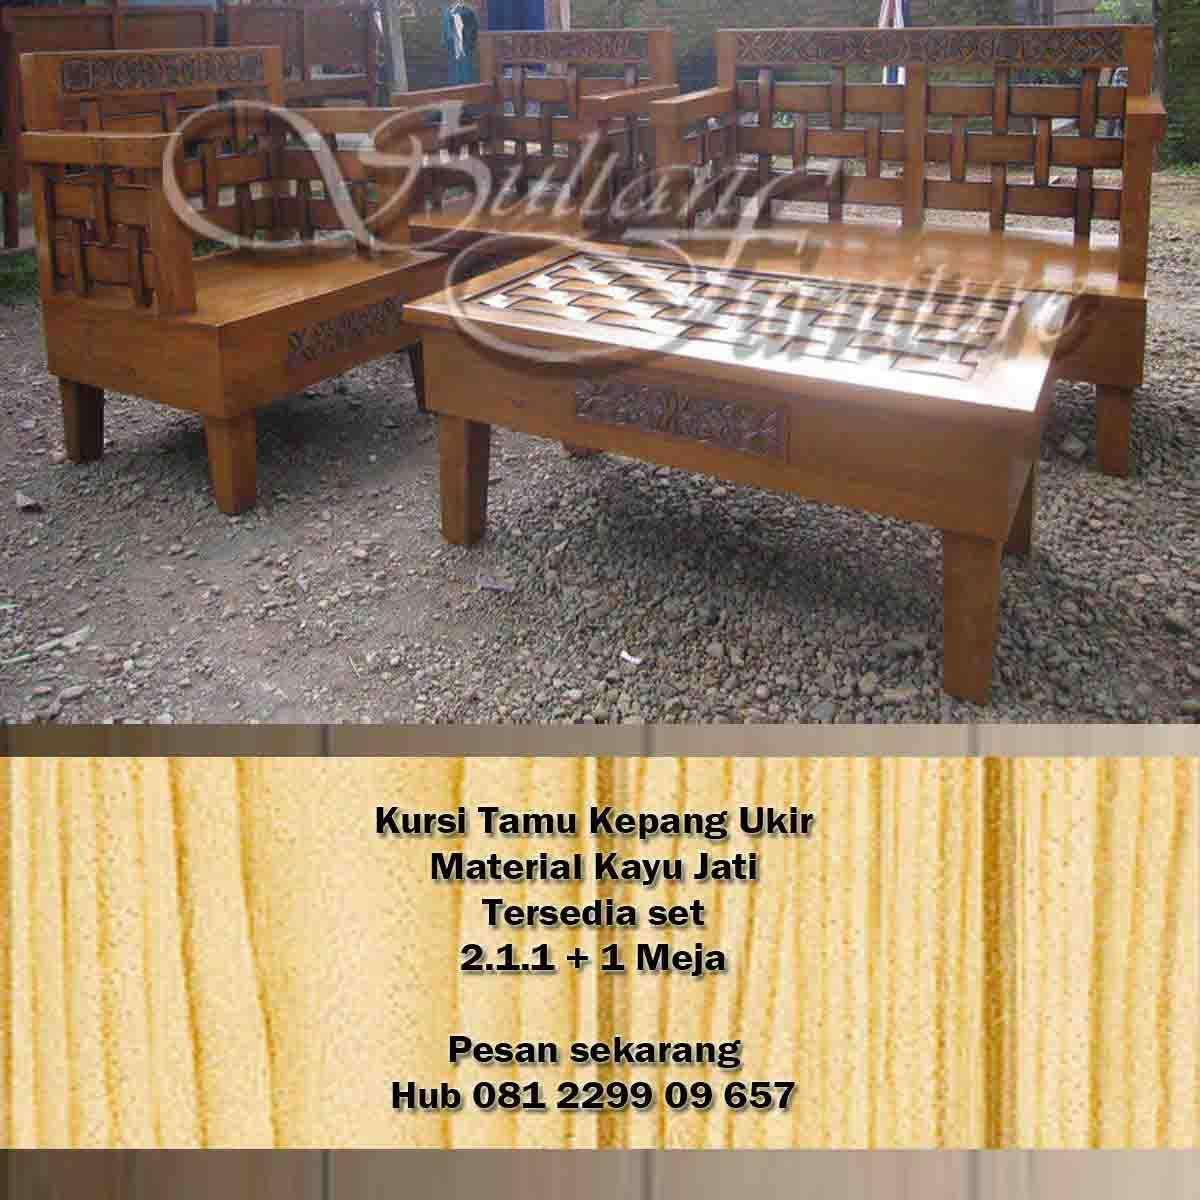 Jual Furniture Jati Jepara Supplier Furniture Mebel Jati